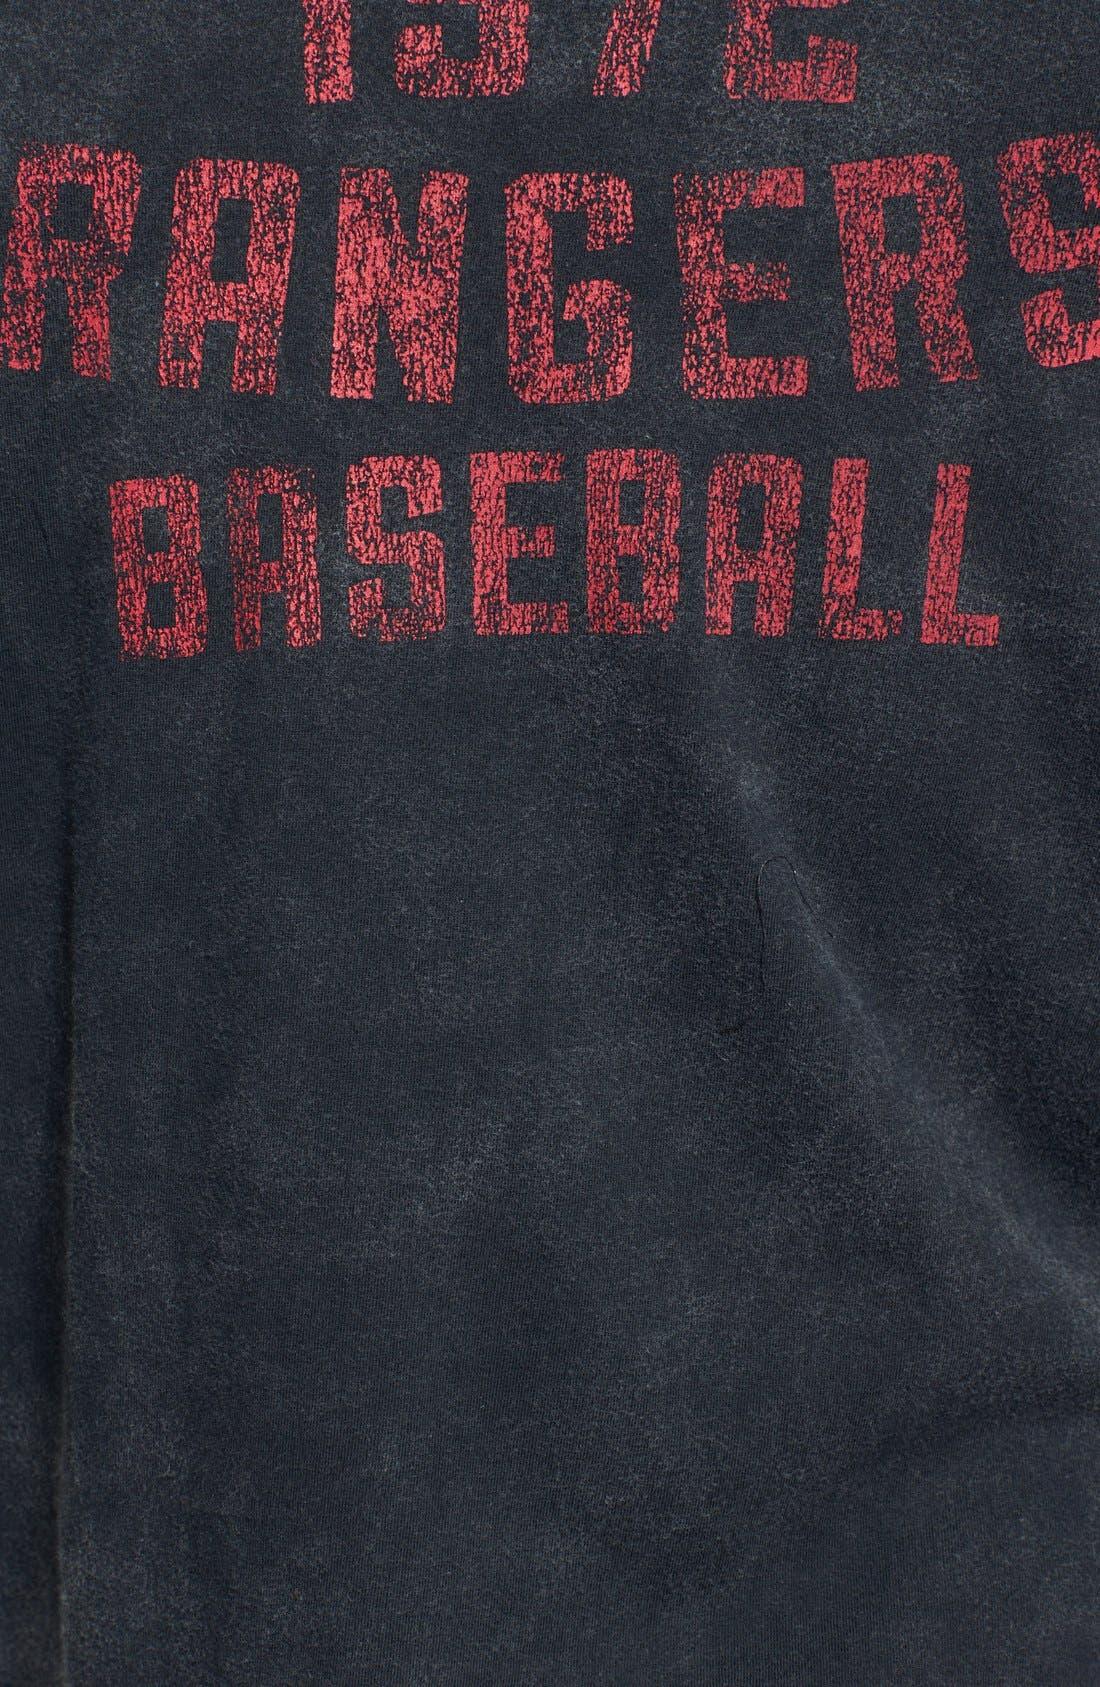 Alternate Image 3  - Red Jacket 'Texas Rangers' Trim Fit T-Shirt